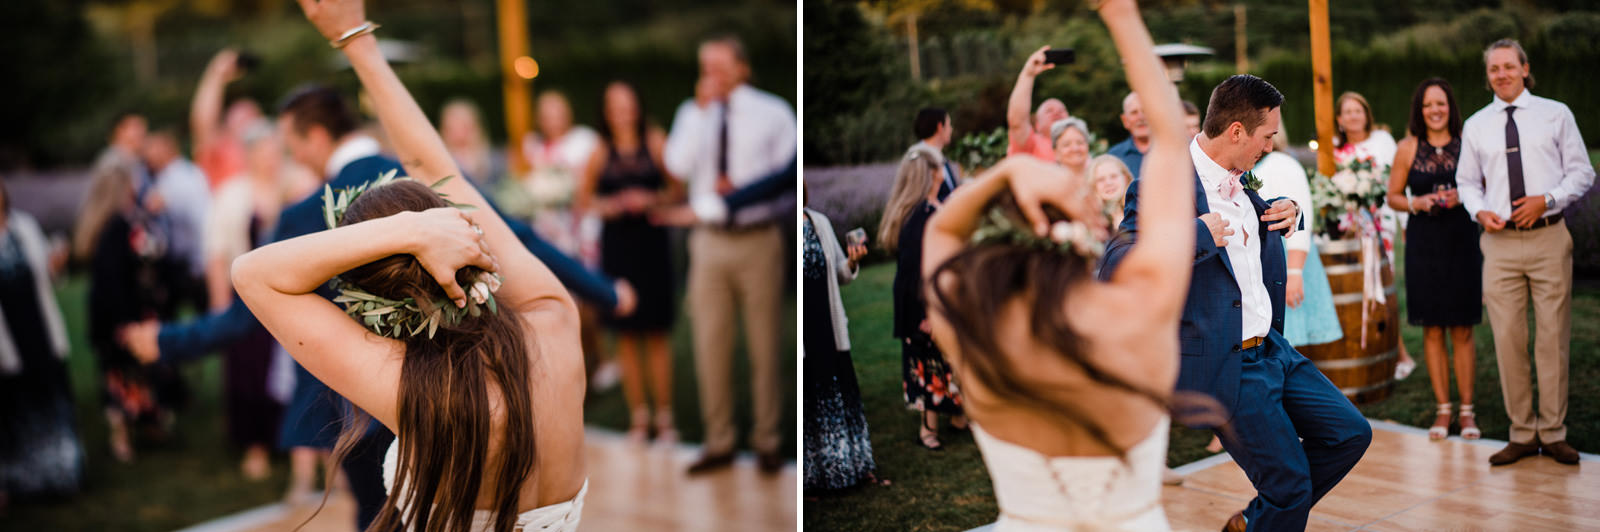 106-woodinville-lavendar-farm-wedding-with-golden-glowy-photos.jpg